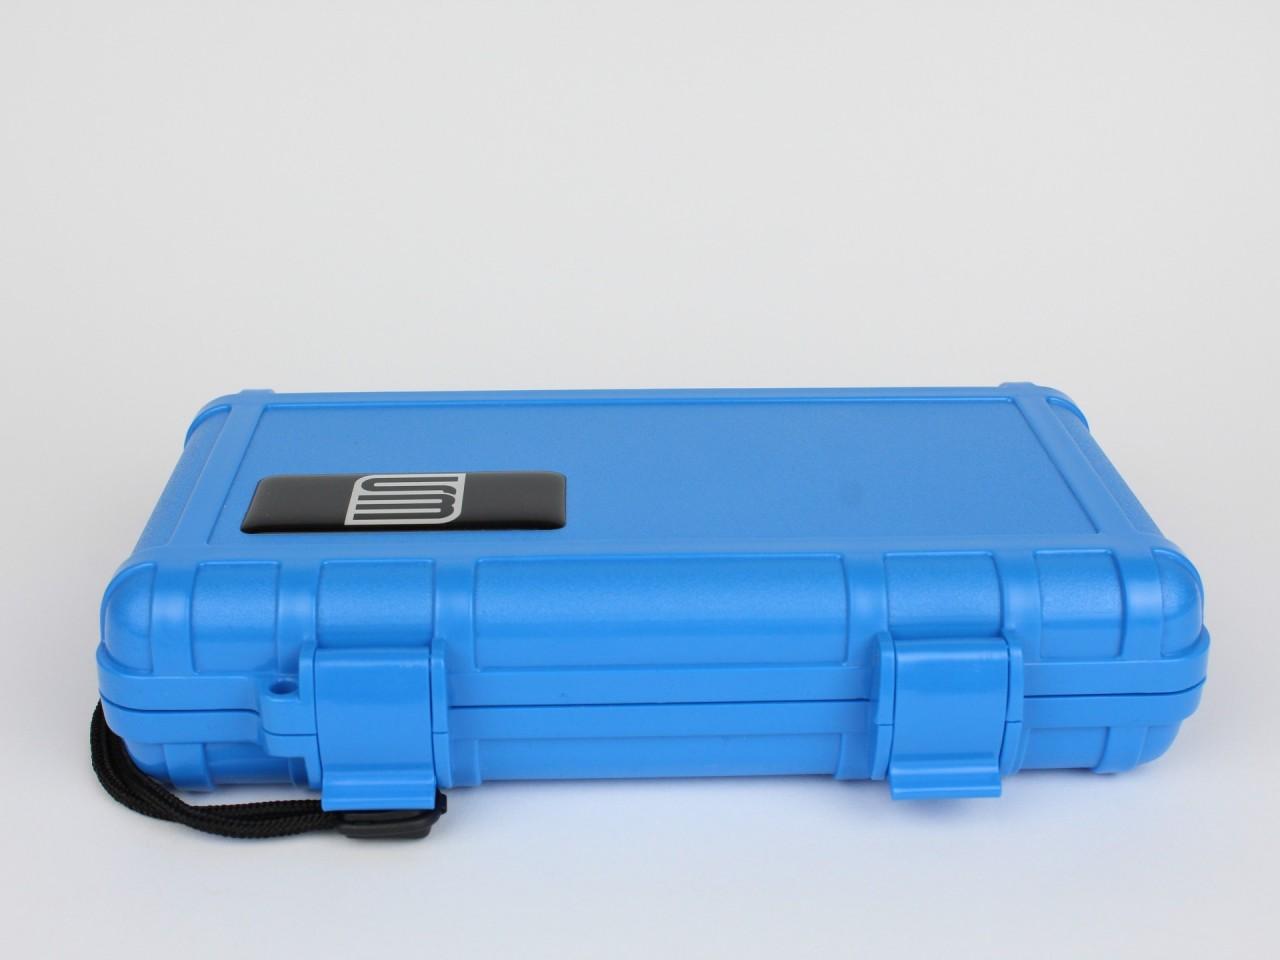 Cigar Case S3 blau (5 Cigarren)